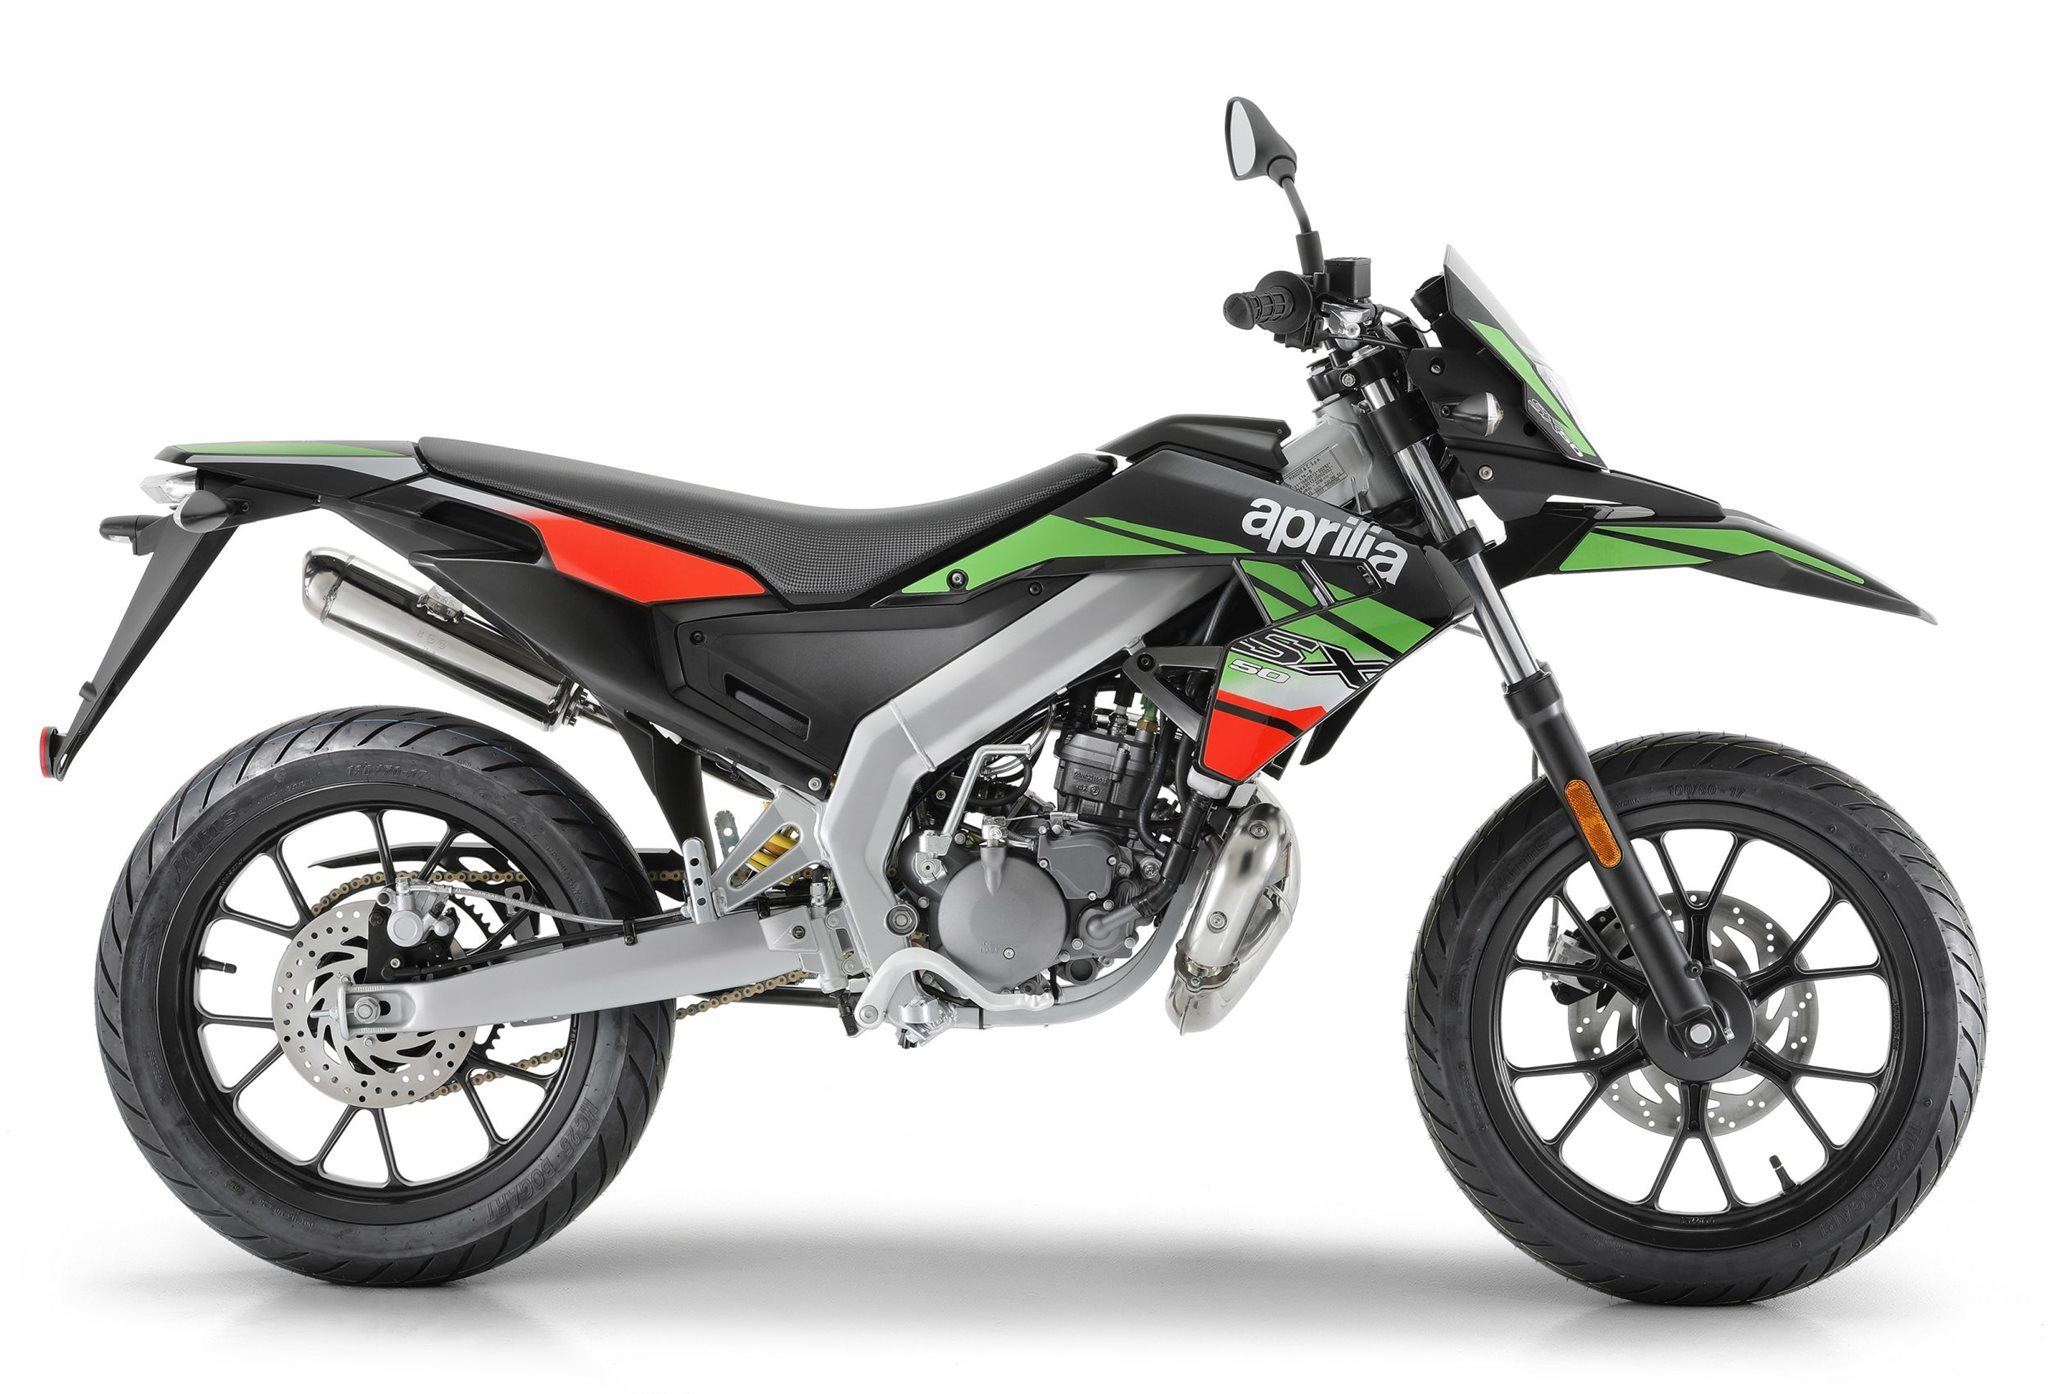 Aprilia SX 50 Supermoto Motorrad, gebraucht